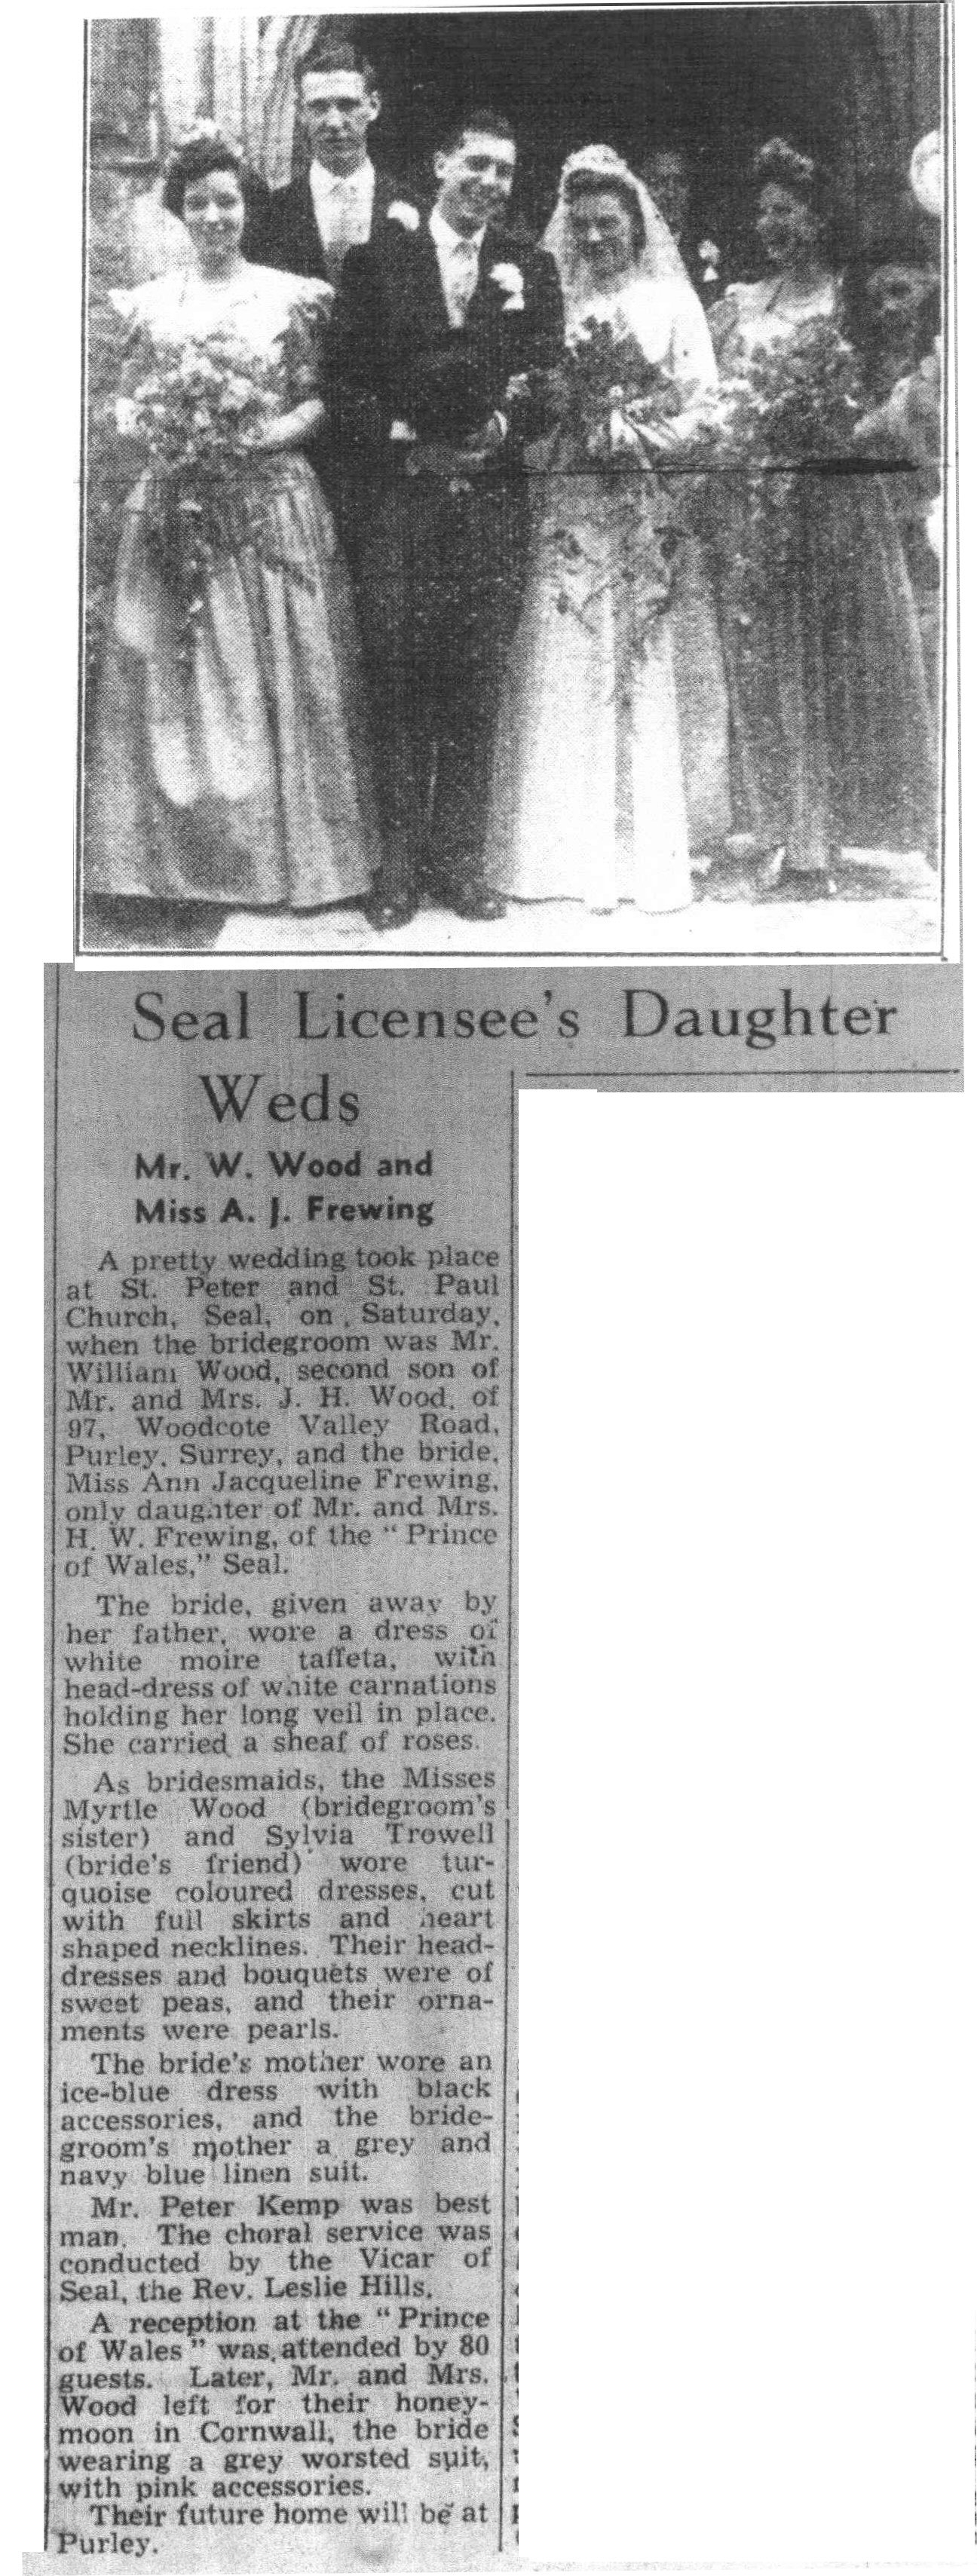 sevenoaks-news-thu-22-june-1950.jpg